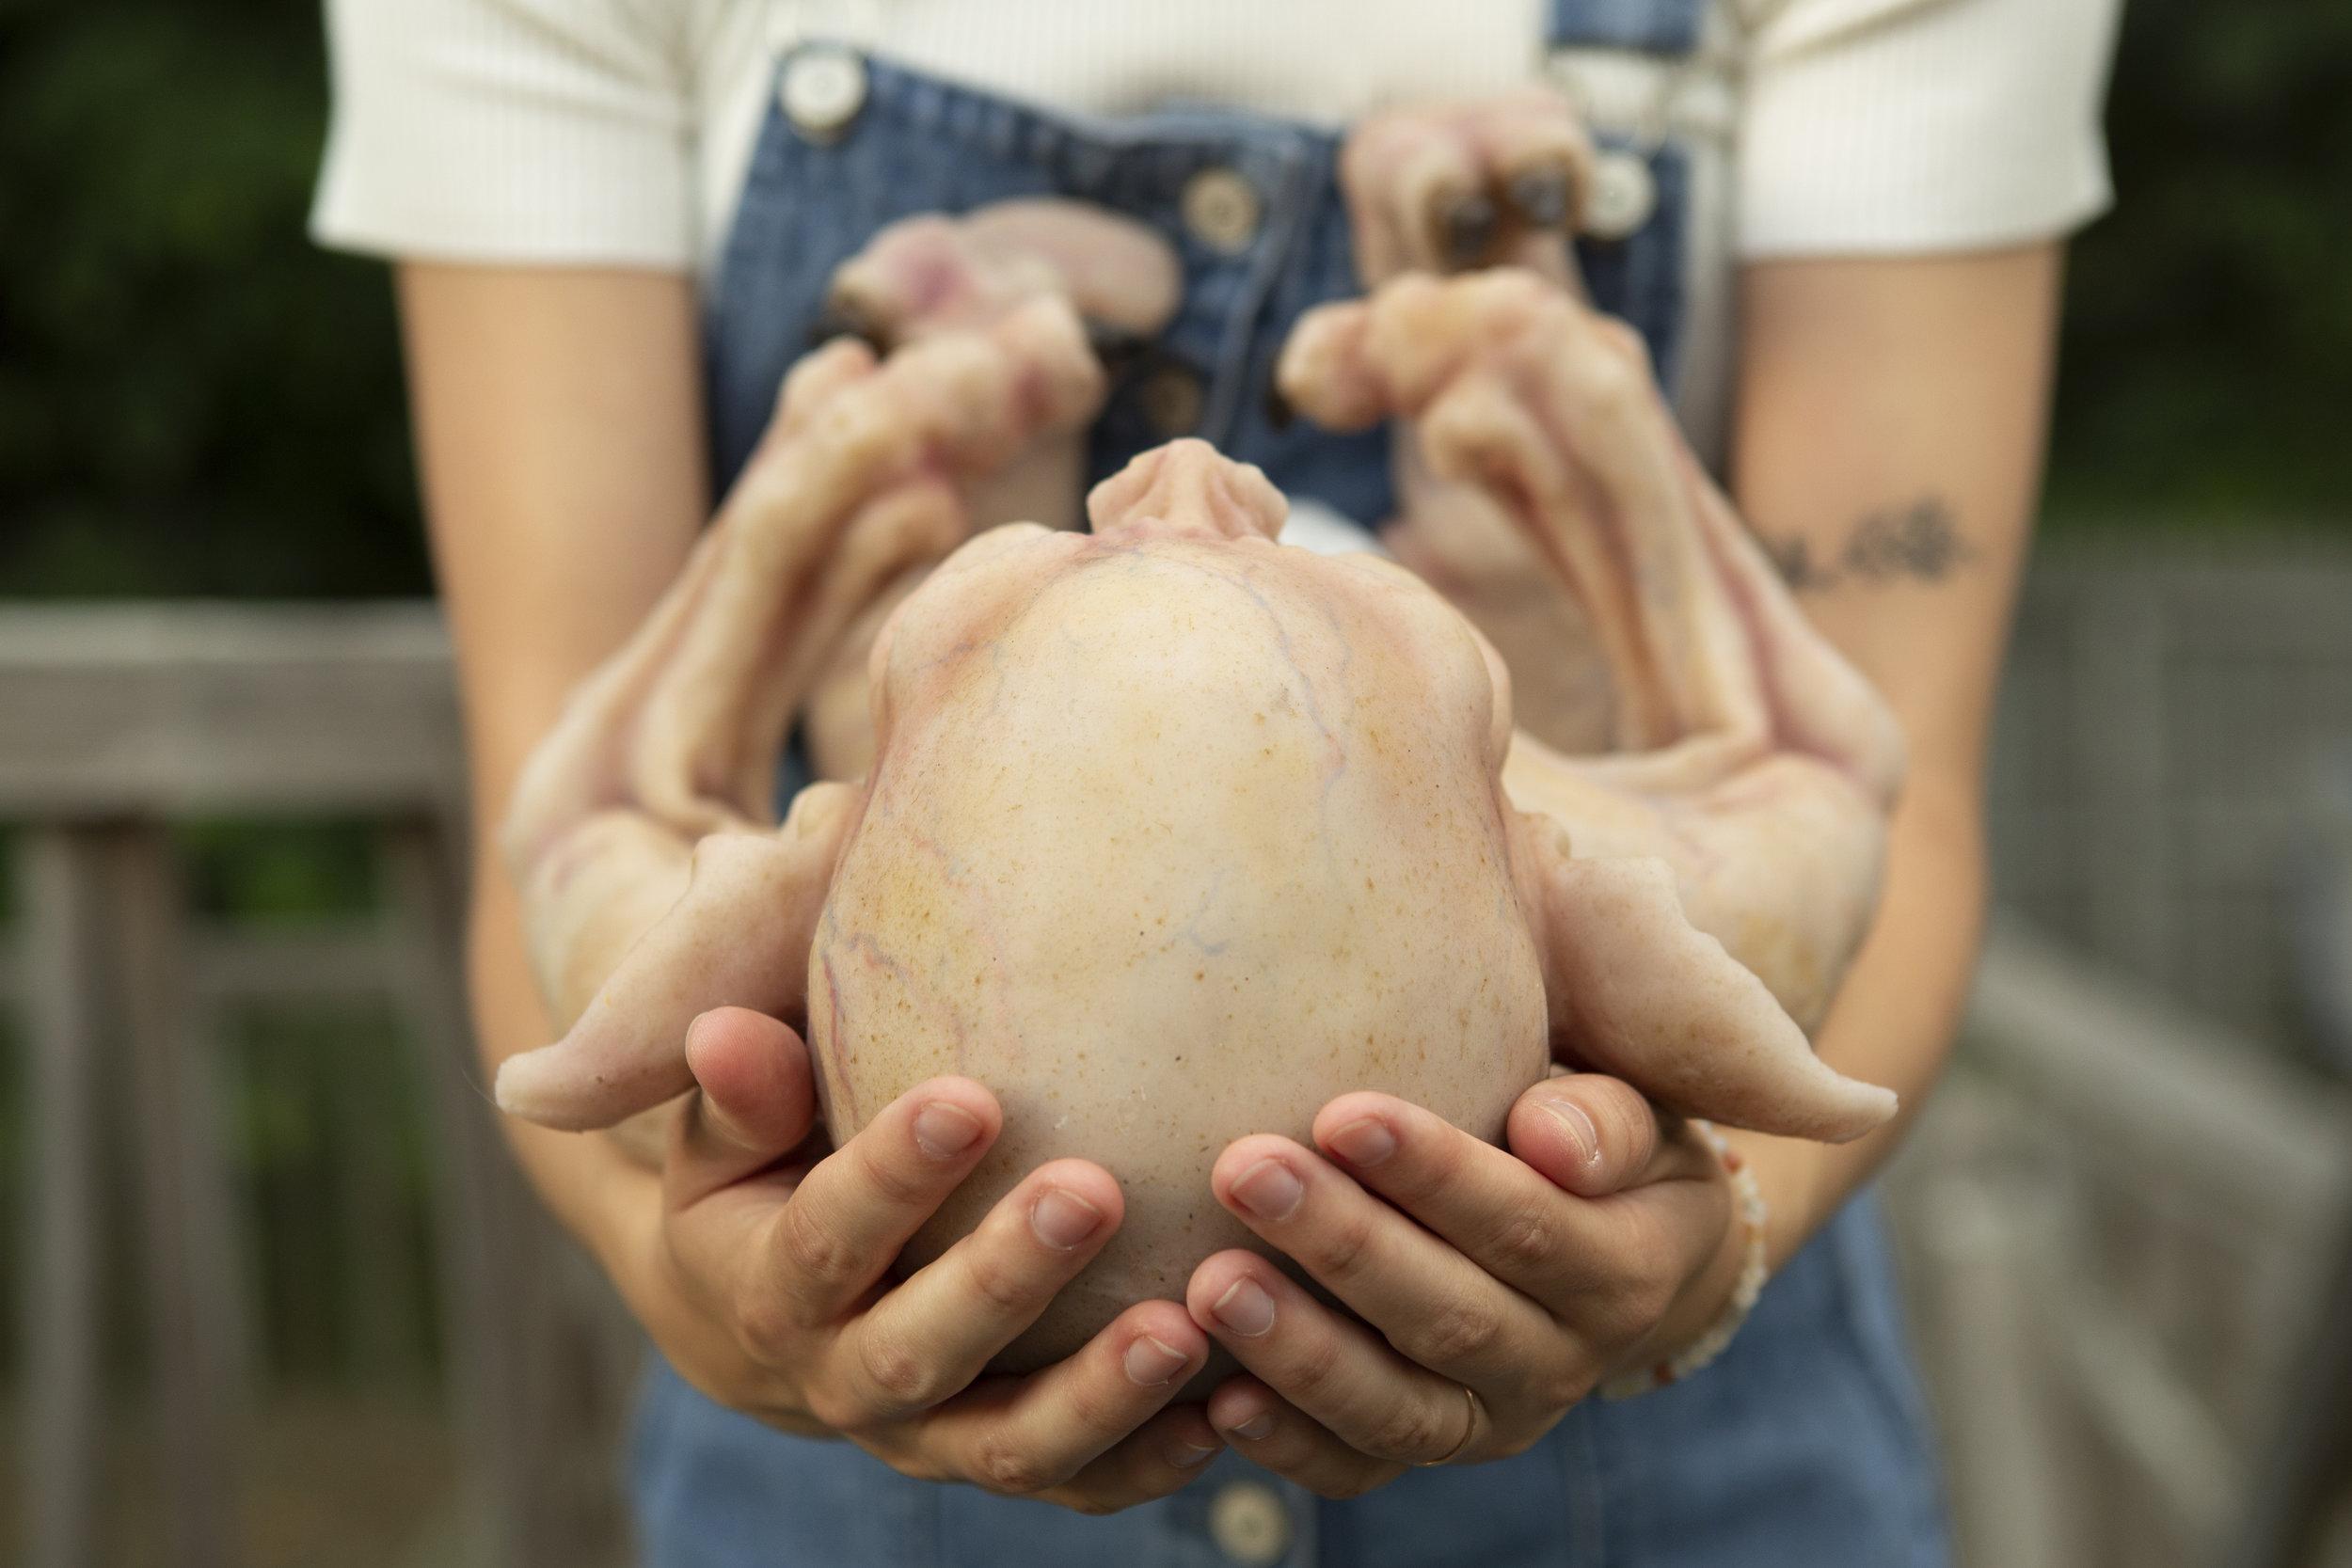 Head in Hands  | Newborn Vampire  | Newborn photoshoot | Ravendark Creations Vampire Baby | Newborn Photoshoots | Alyssia Booth's Candid & Studio | www.abcandidstudio.com